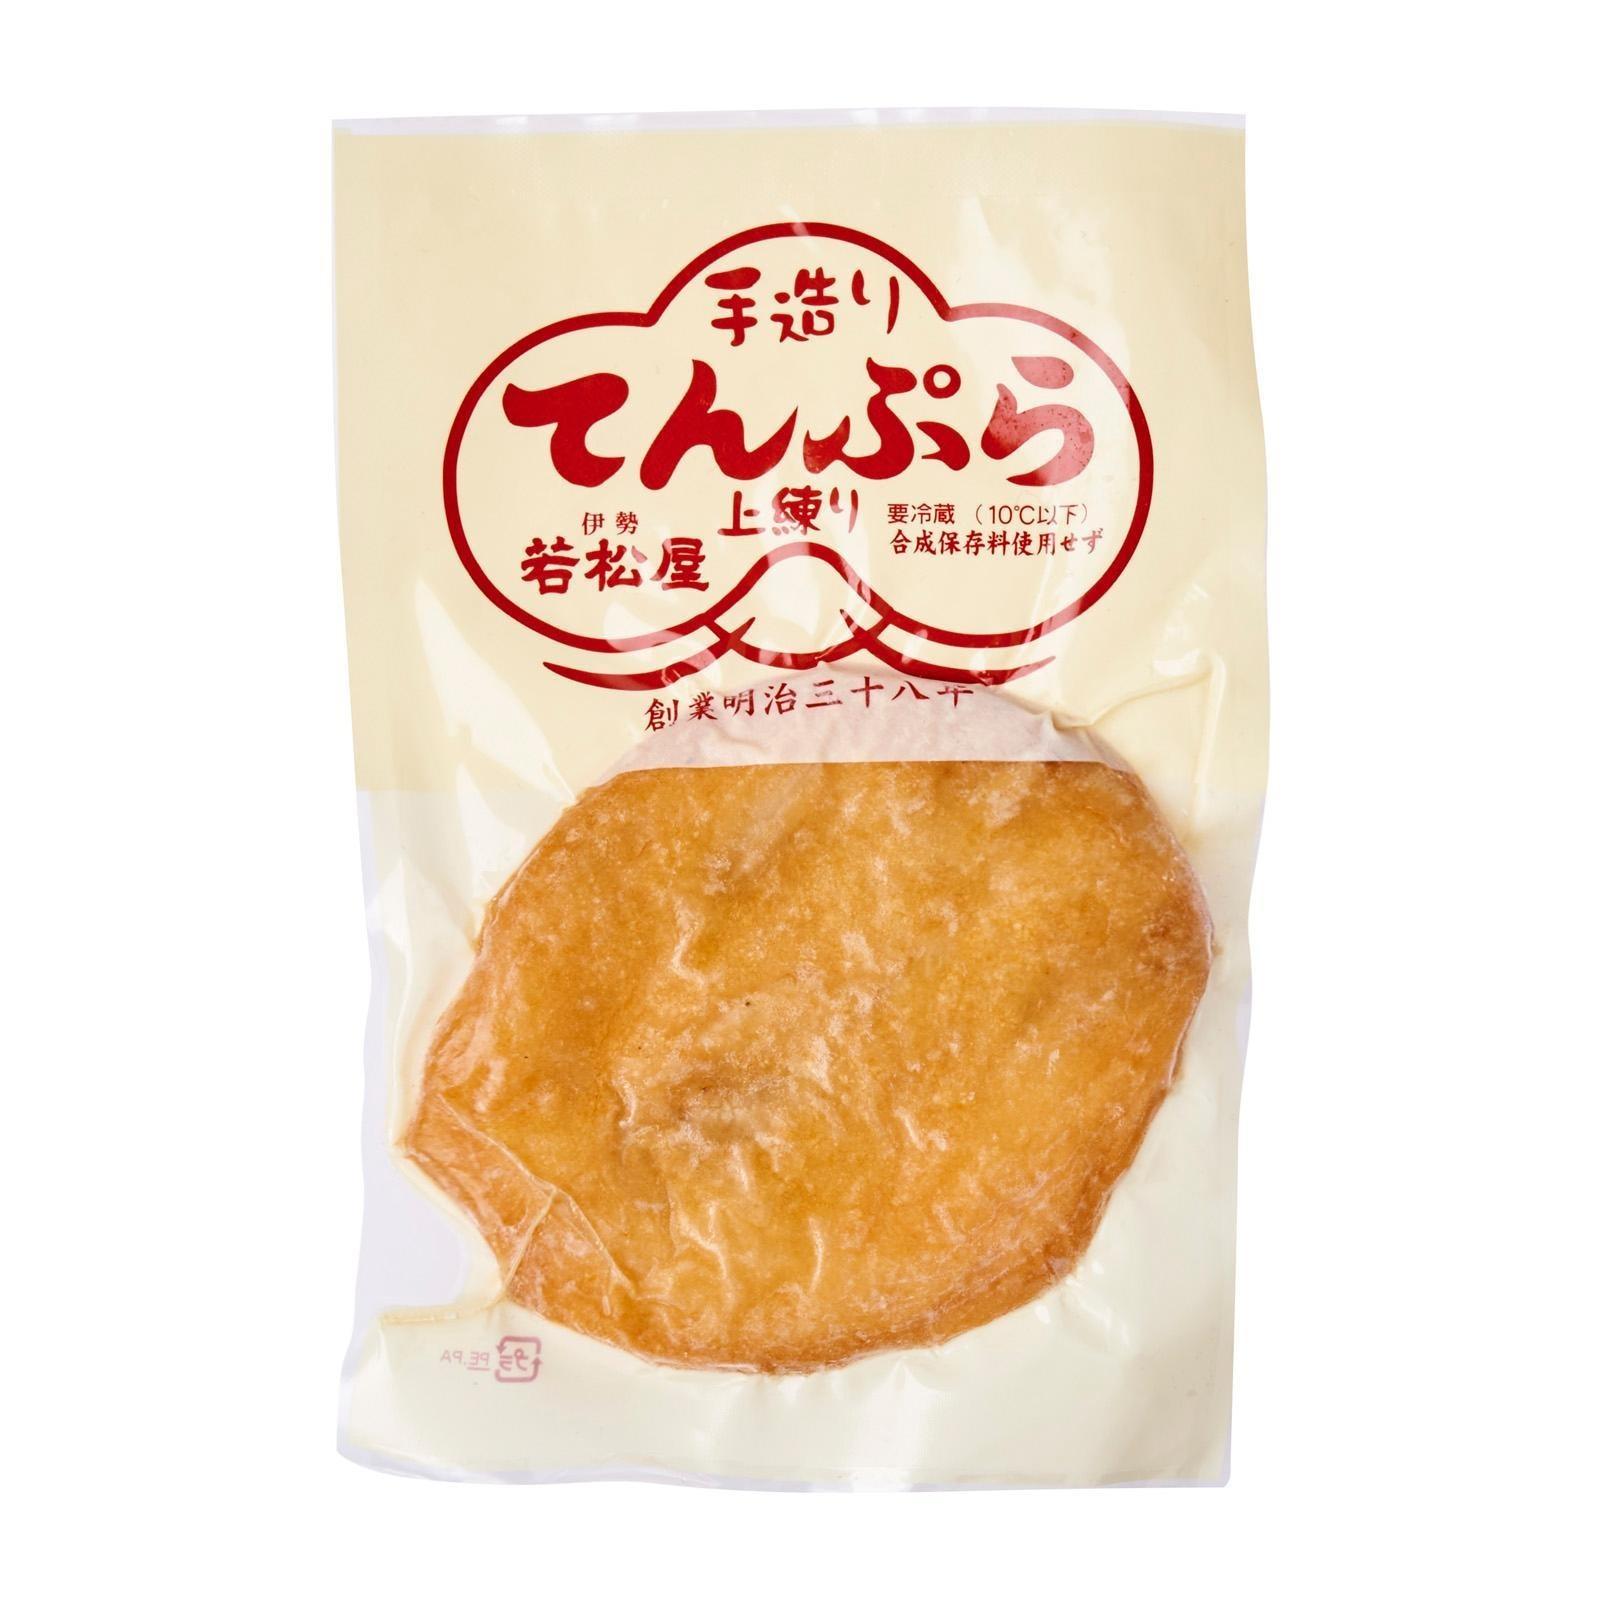 Wakamatsuya Tempura Gobo-Ten Fish Cakes - Frozen - Kirei